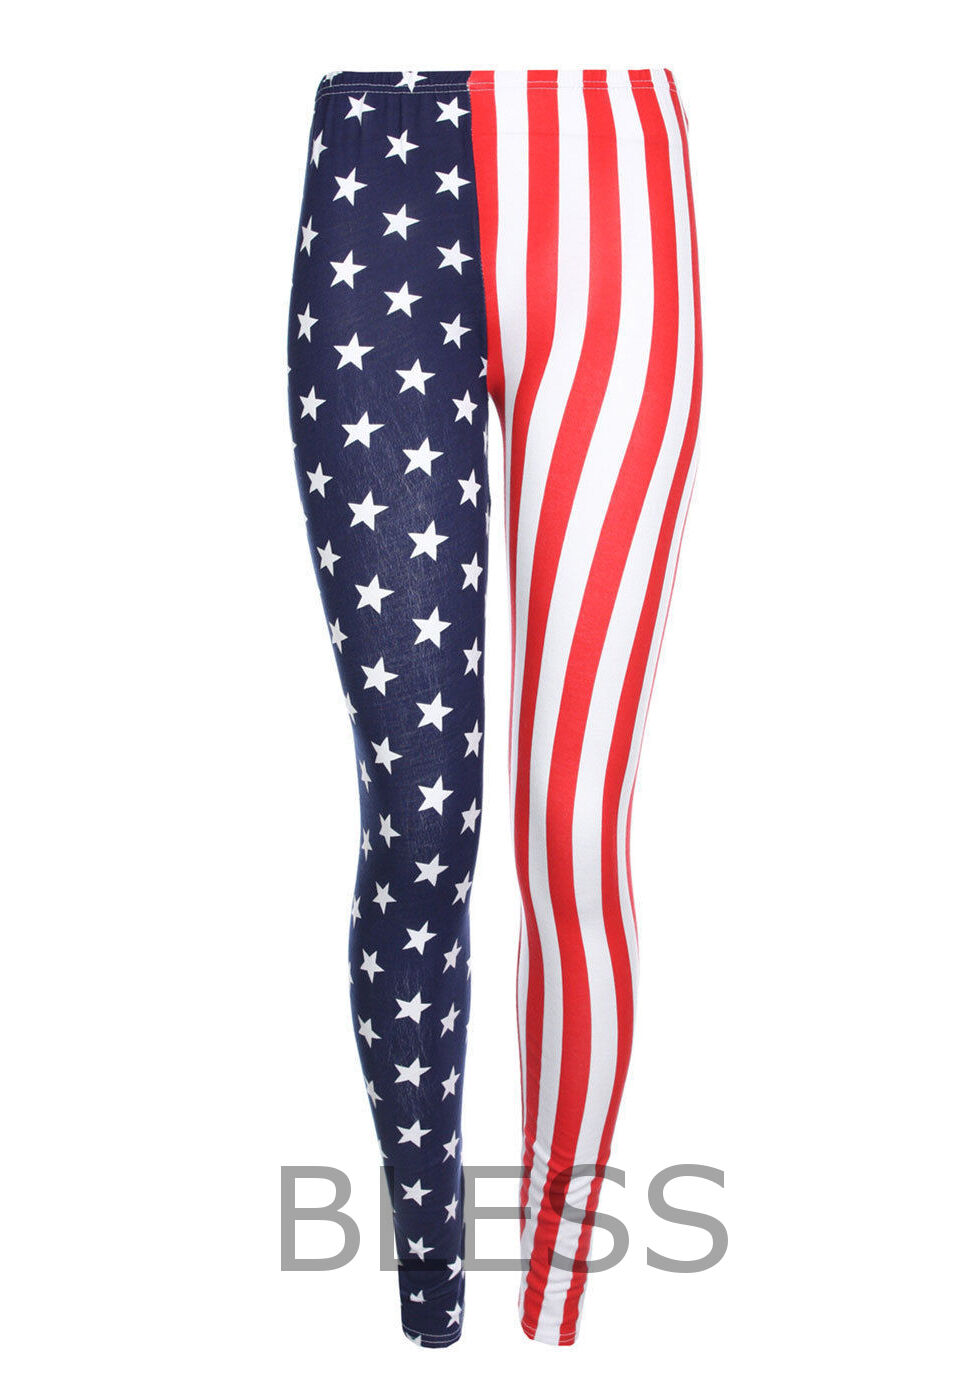 GIRLS USA AMERICAN FLAG LEGGINGS INDEPENDANCE DAY STARS STRIPES KIDS 5-13 YEARS